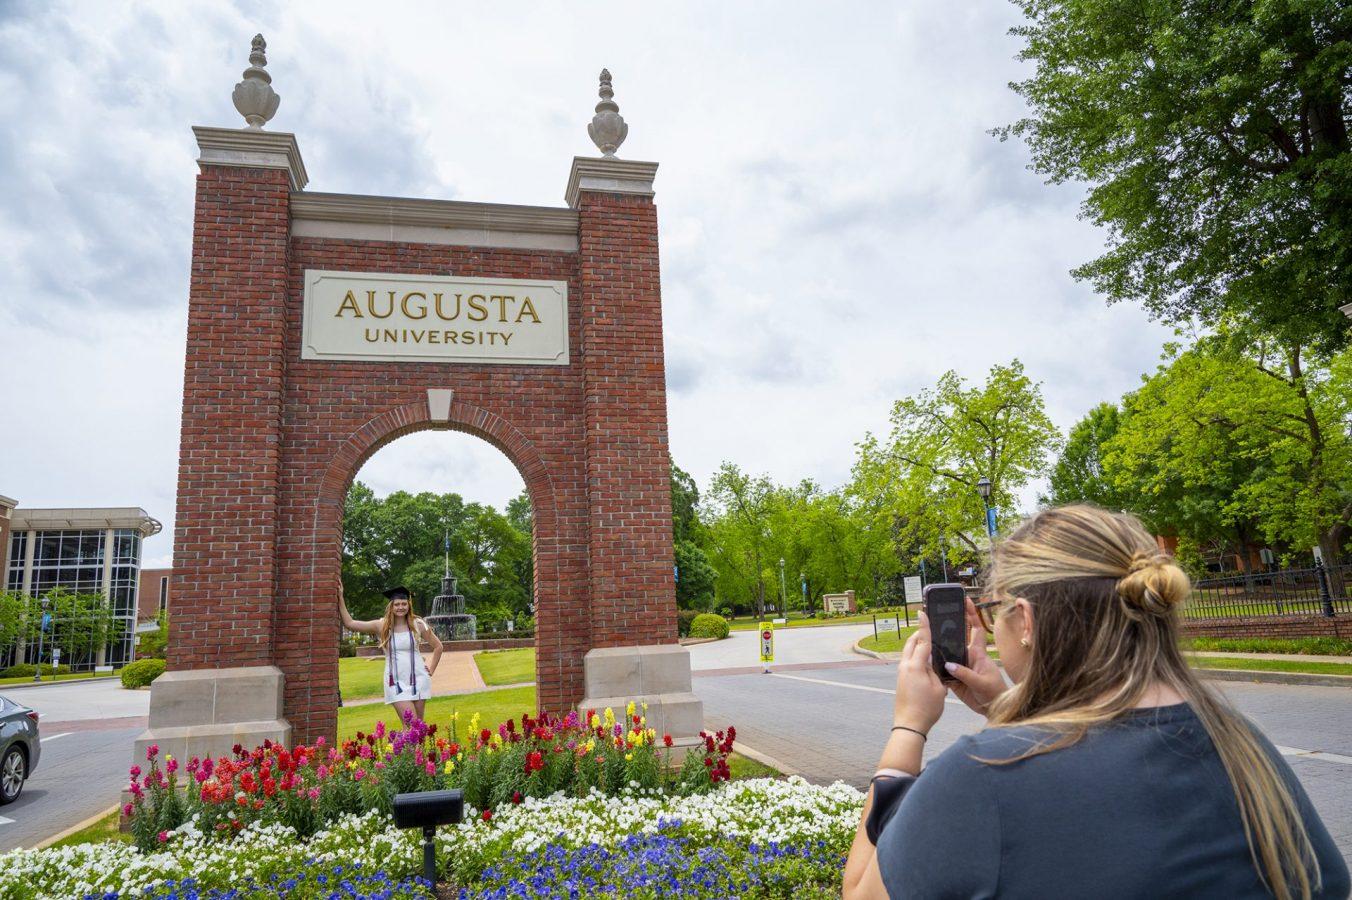 Graduate getting photo taken